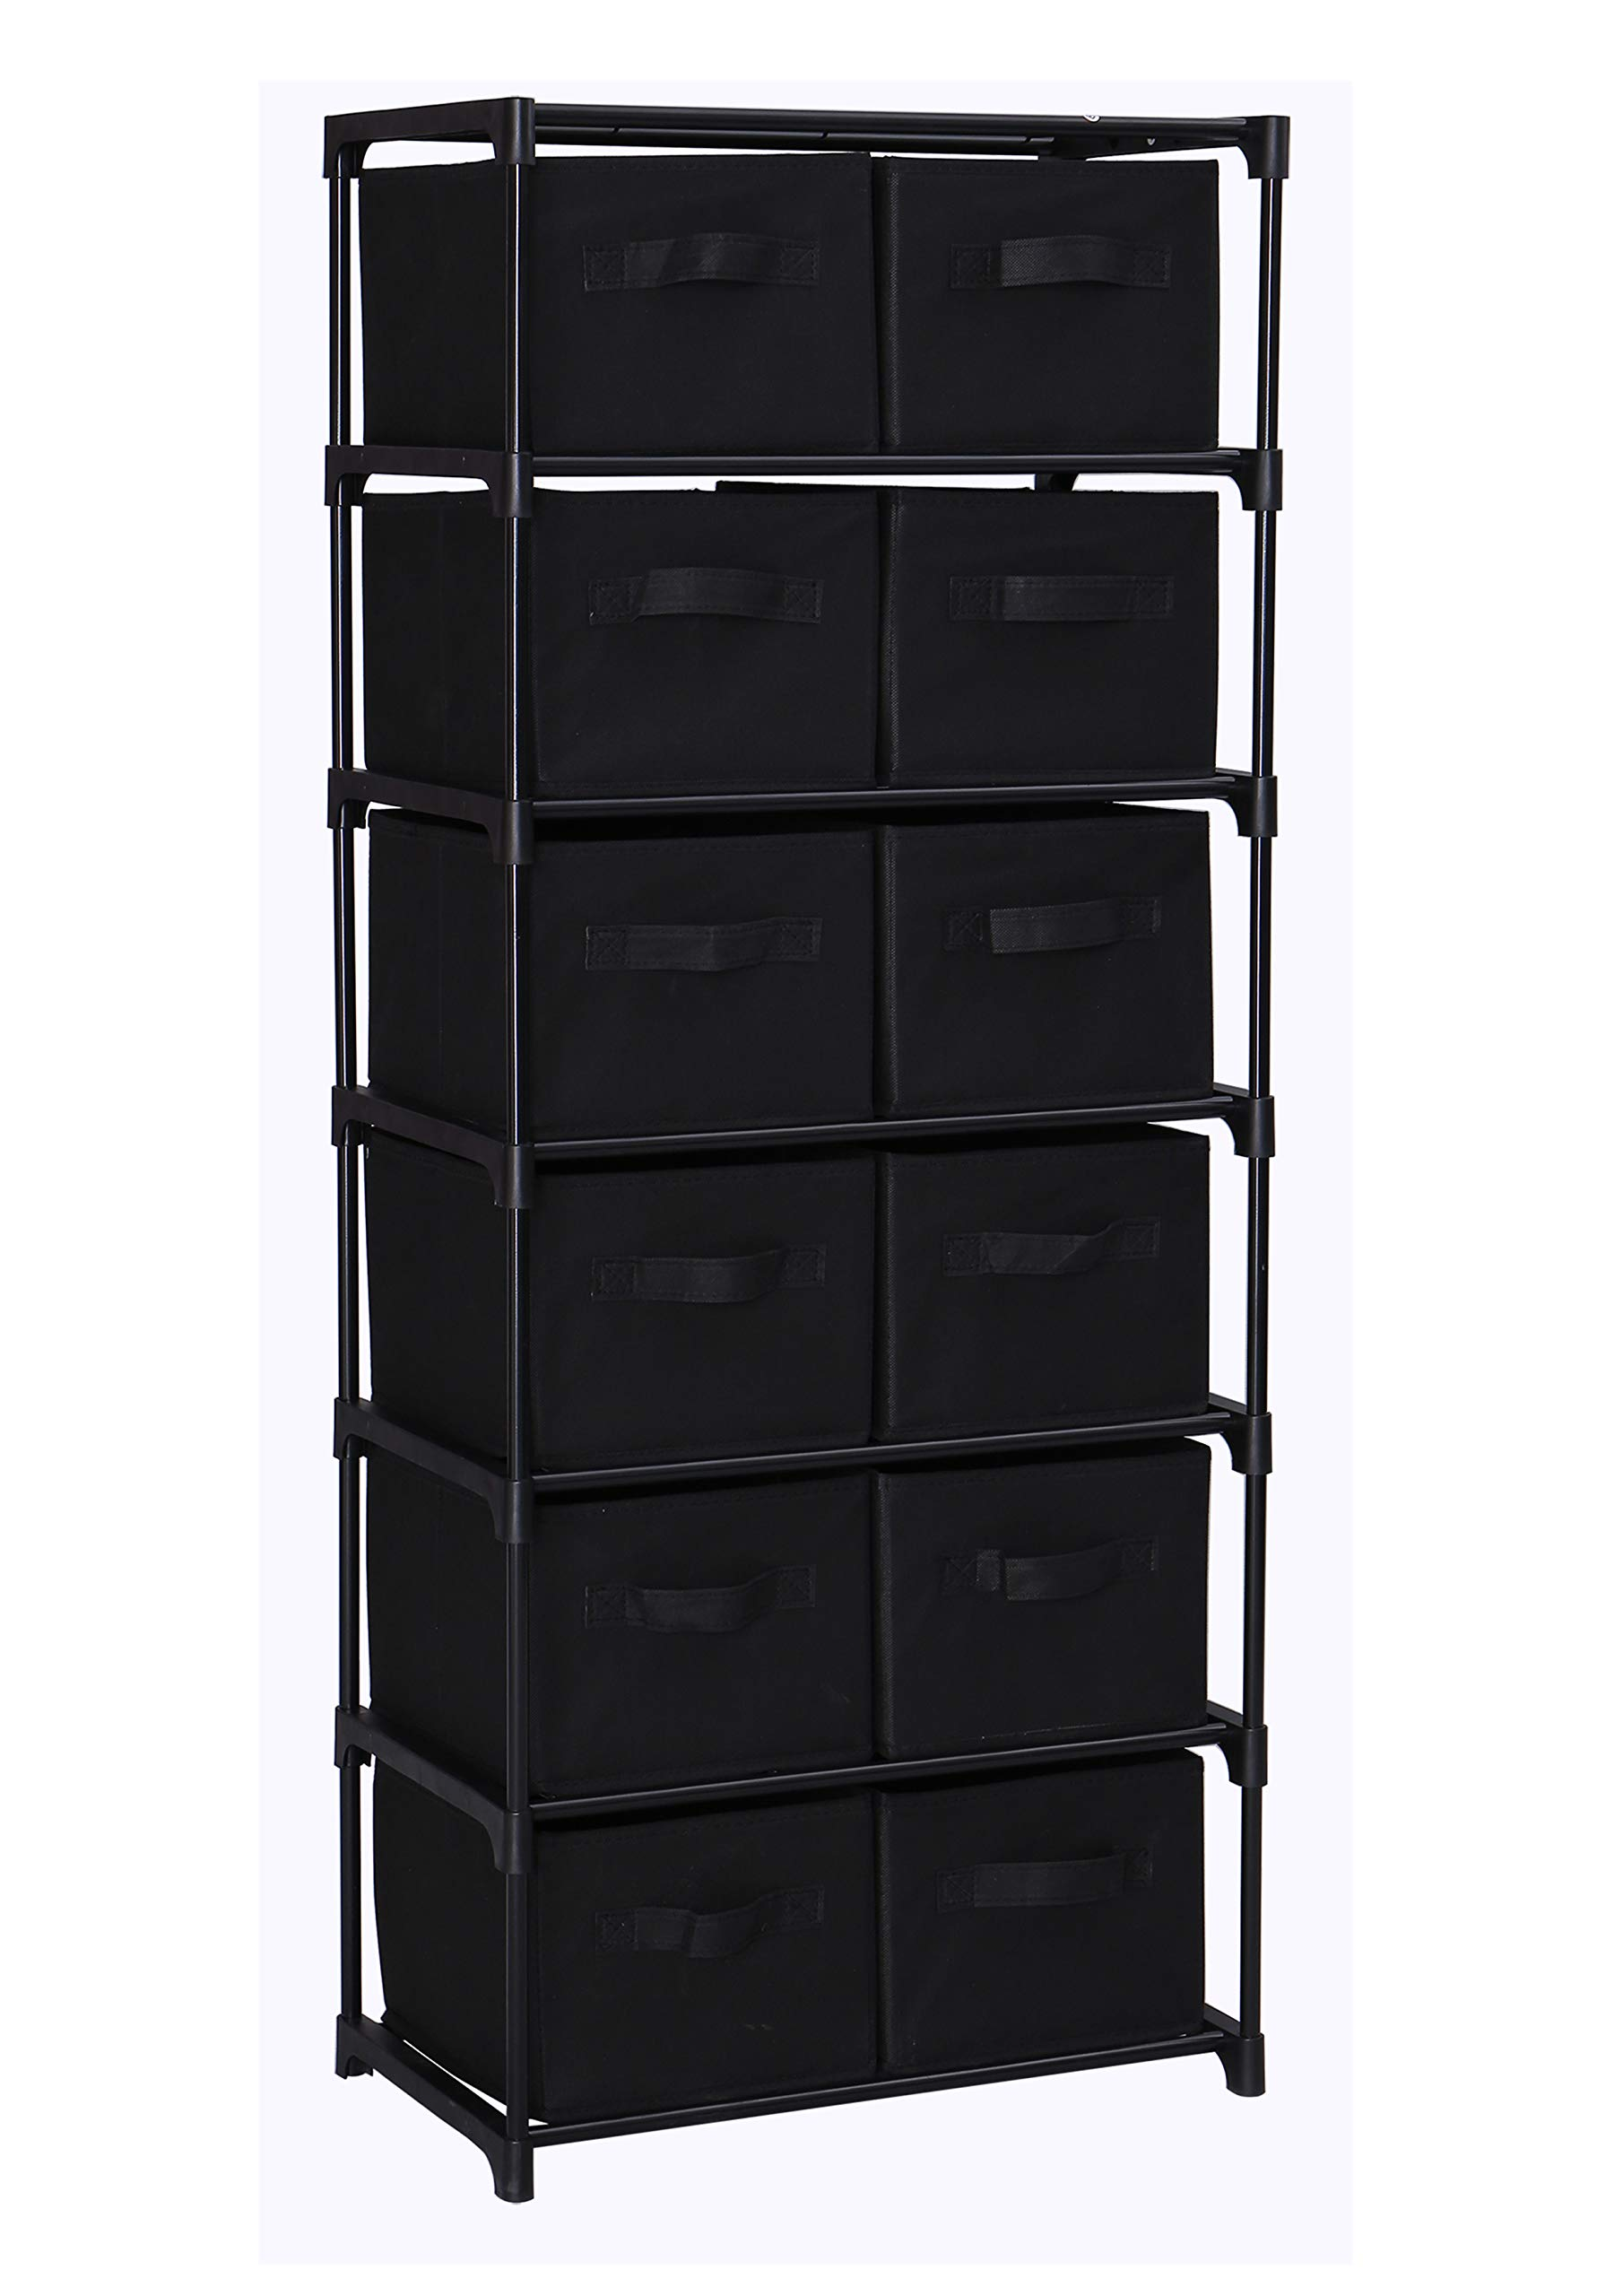 Homebi Drawers Storage Shelf Chest Unit Storage Cabinet Closet Organizer Rack Dresser Storage Towel with Non-Woven Fabric Bins (Black 12-Drawer) by HOME BI